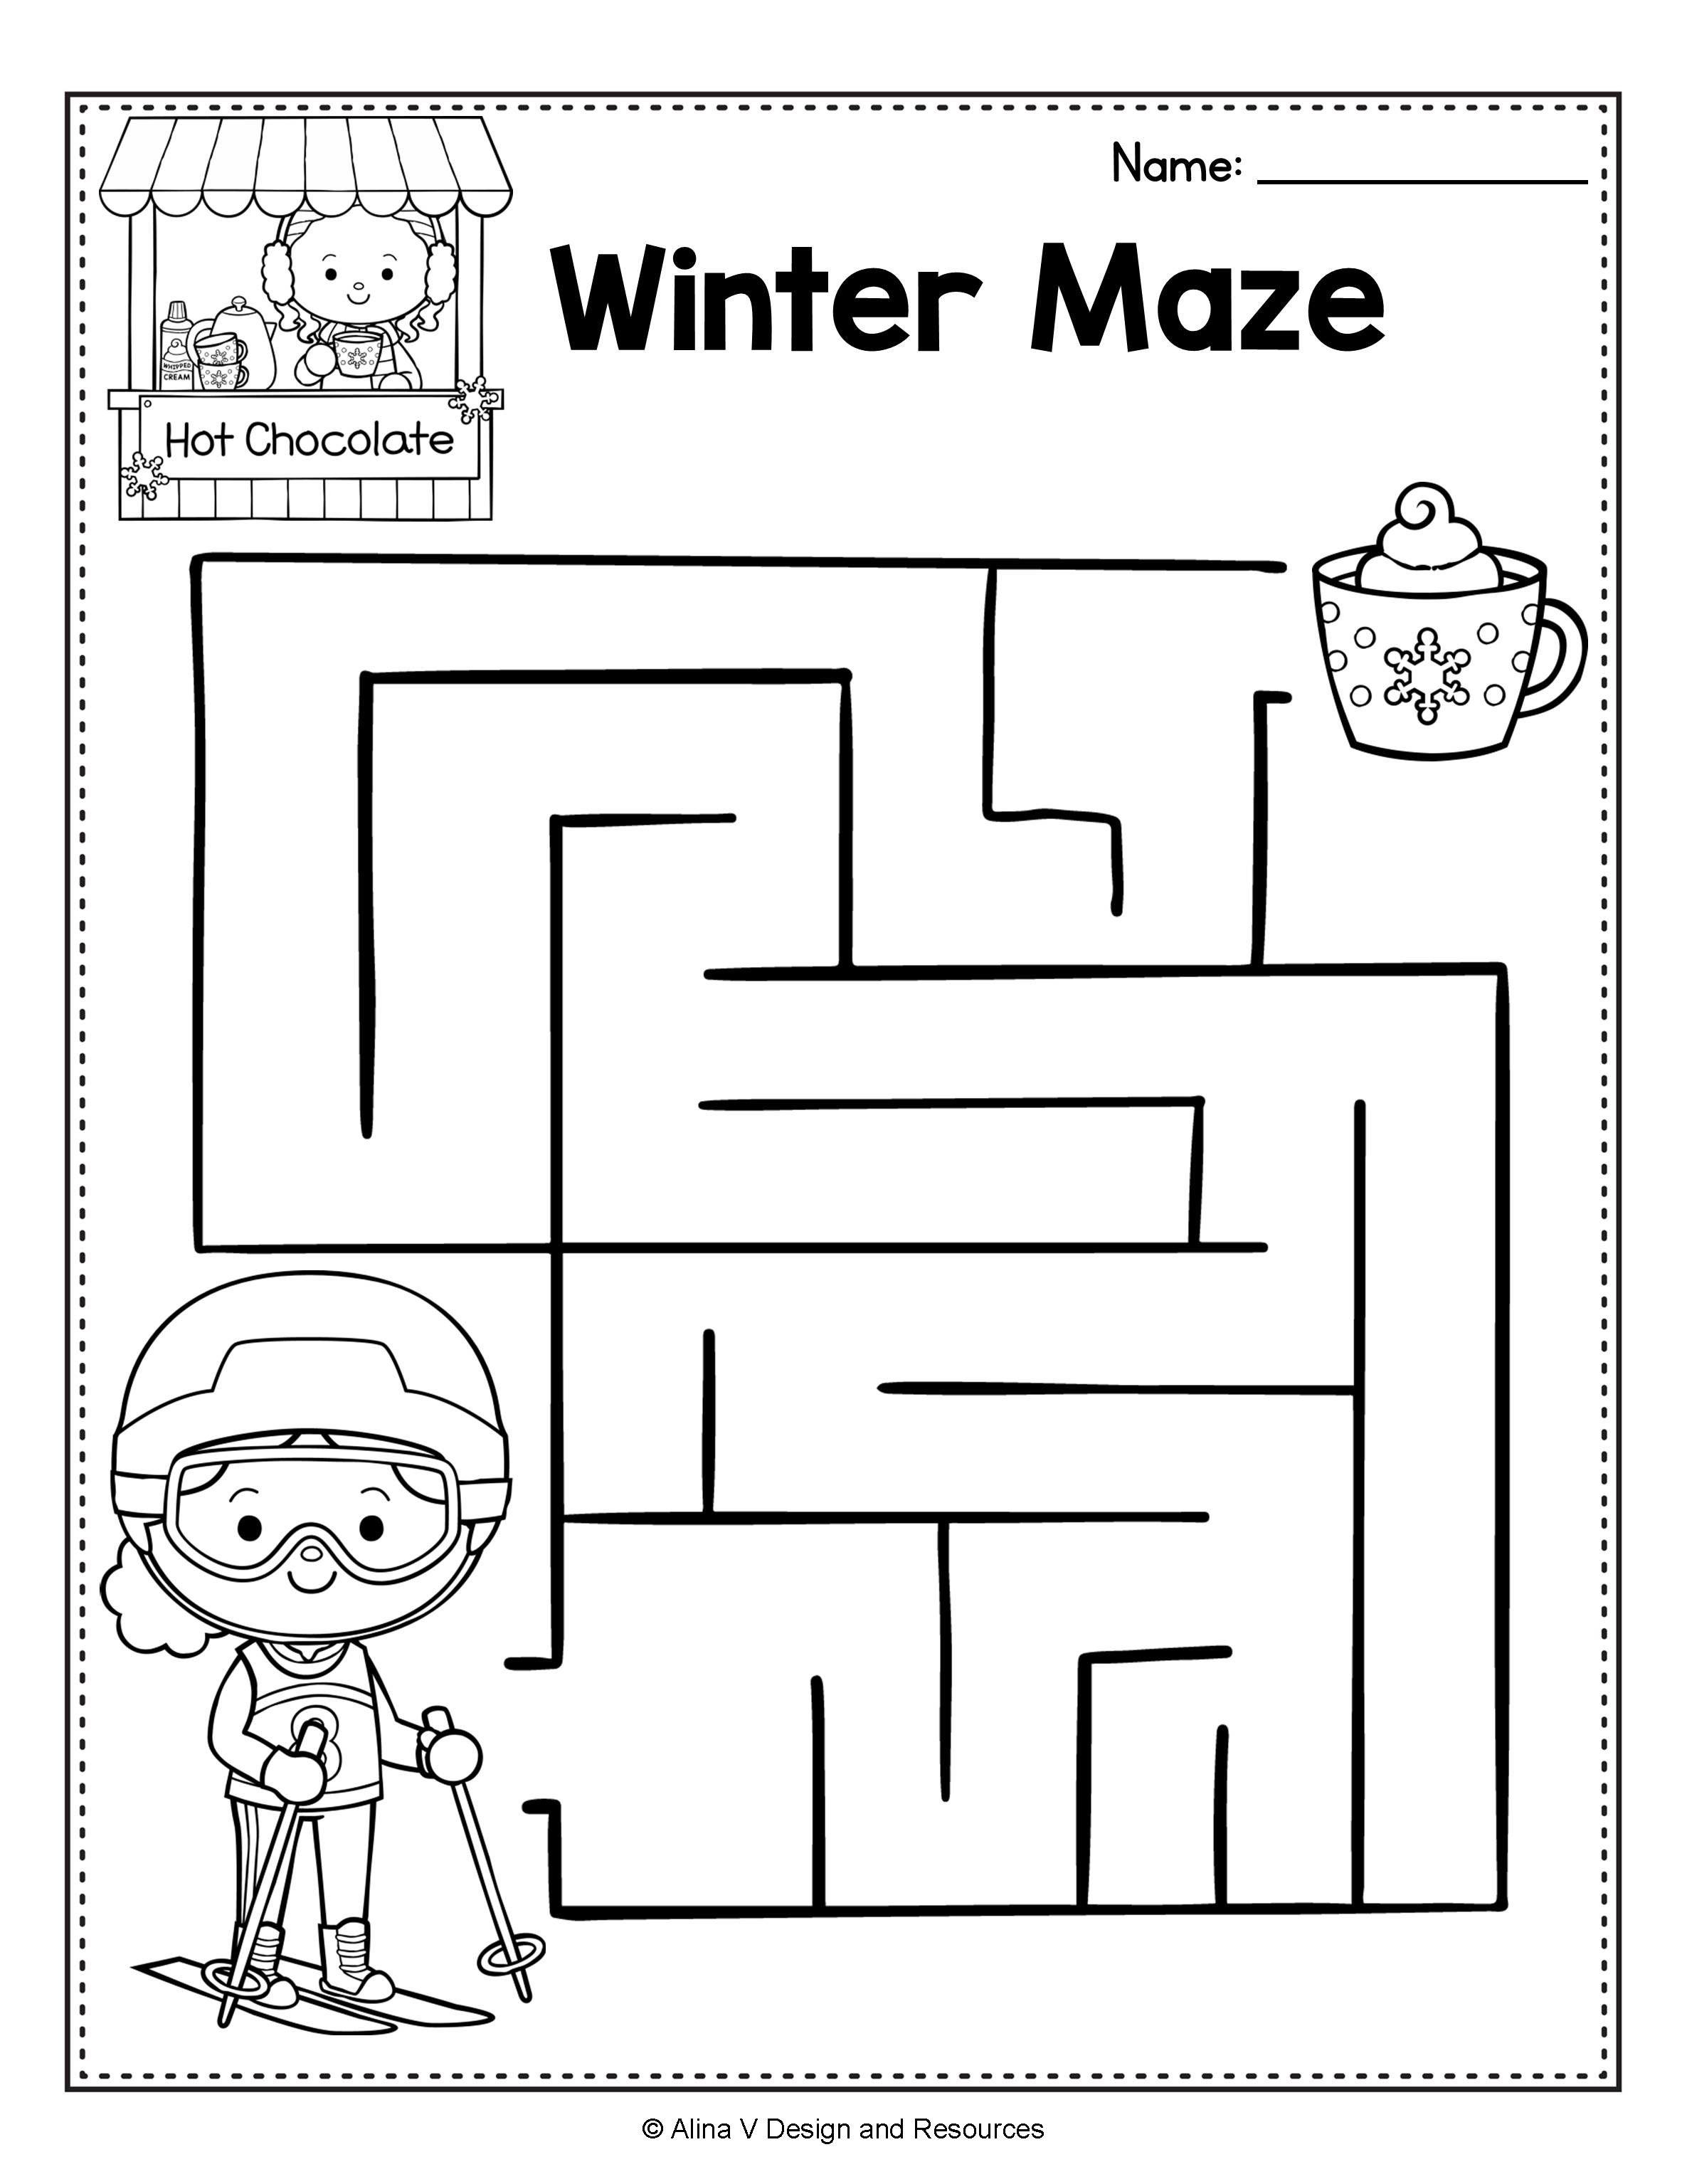 After Winter Break Activity Math Worksheets For Preschool January Morning Work Winter Activities Preschool Winter Songs For Preschool Preschool Winter Worksheets [ 3069 x 2371 Pixel ]